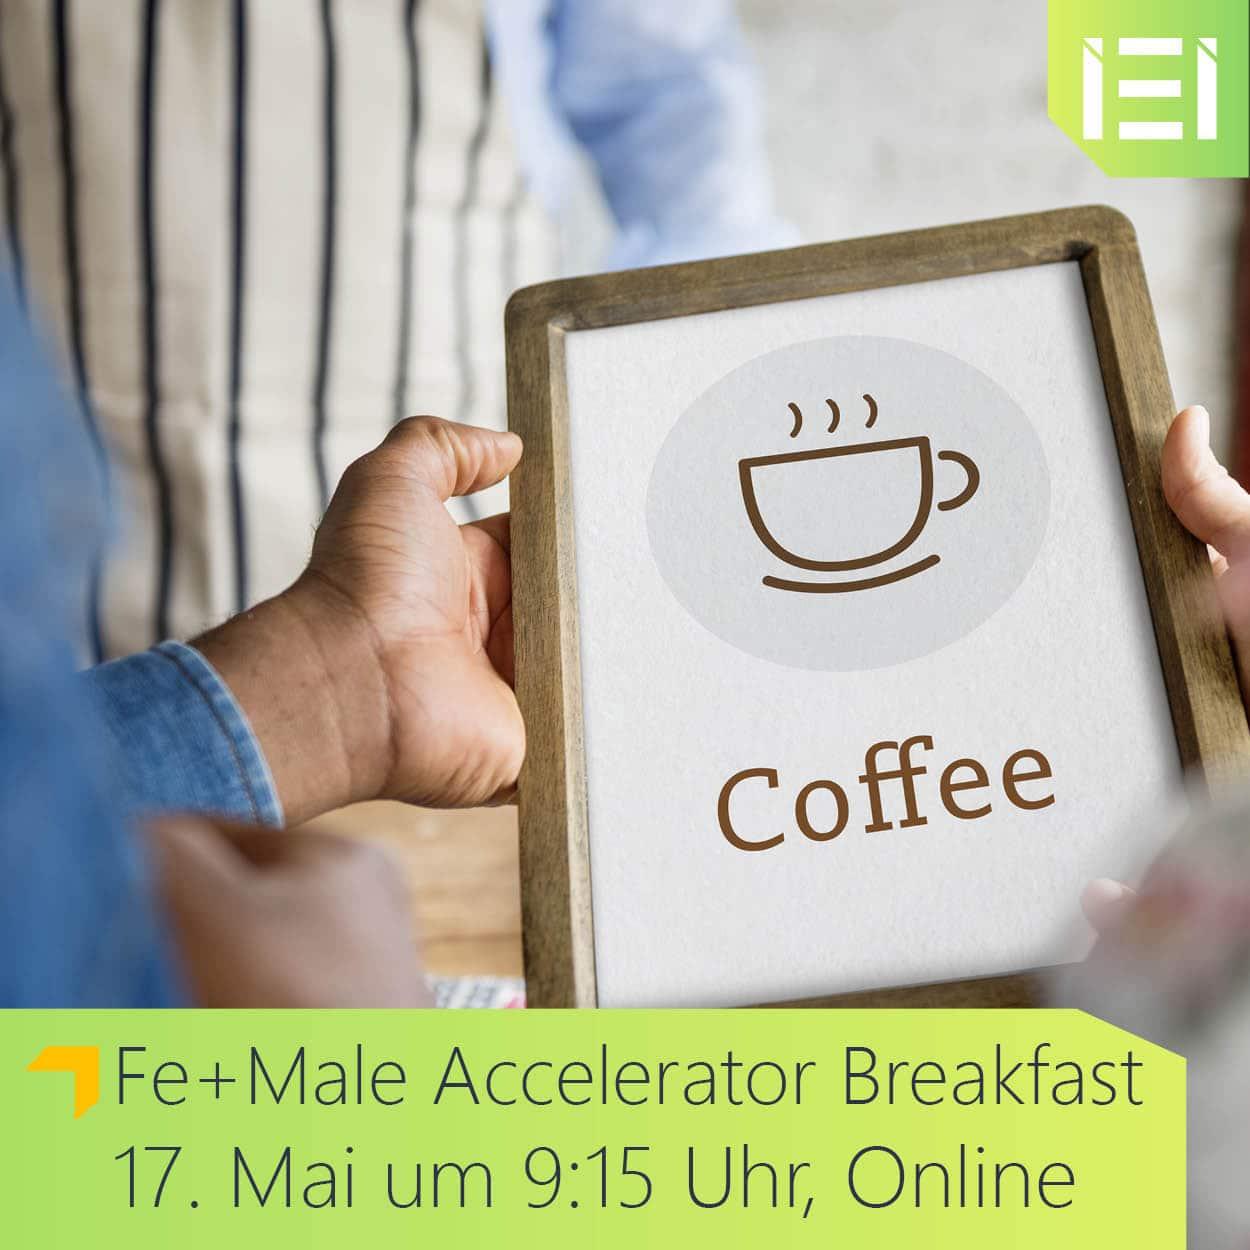 Einladung zum Fe+Male Accelerator Breakfast am 17. Mai 2021